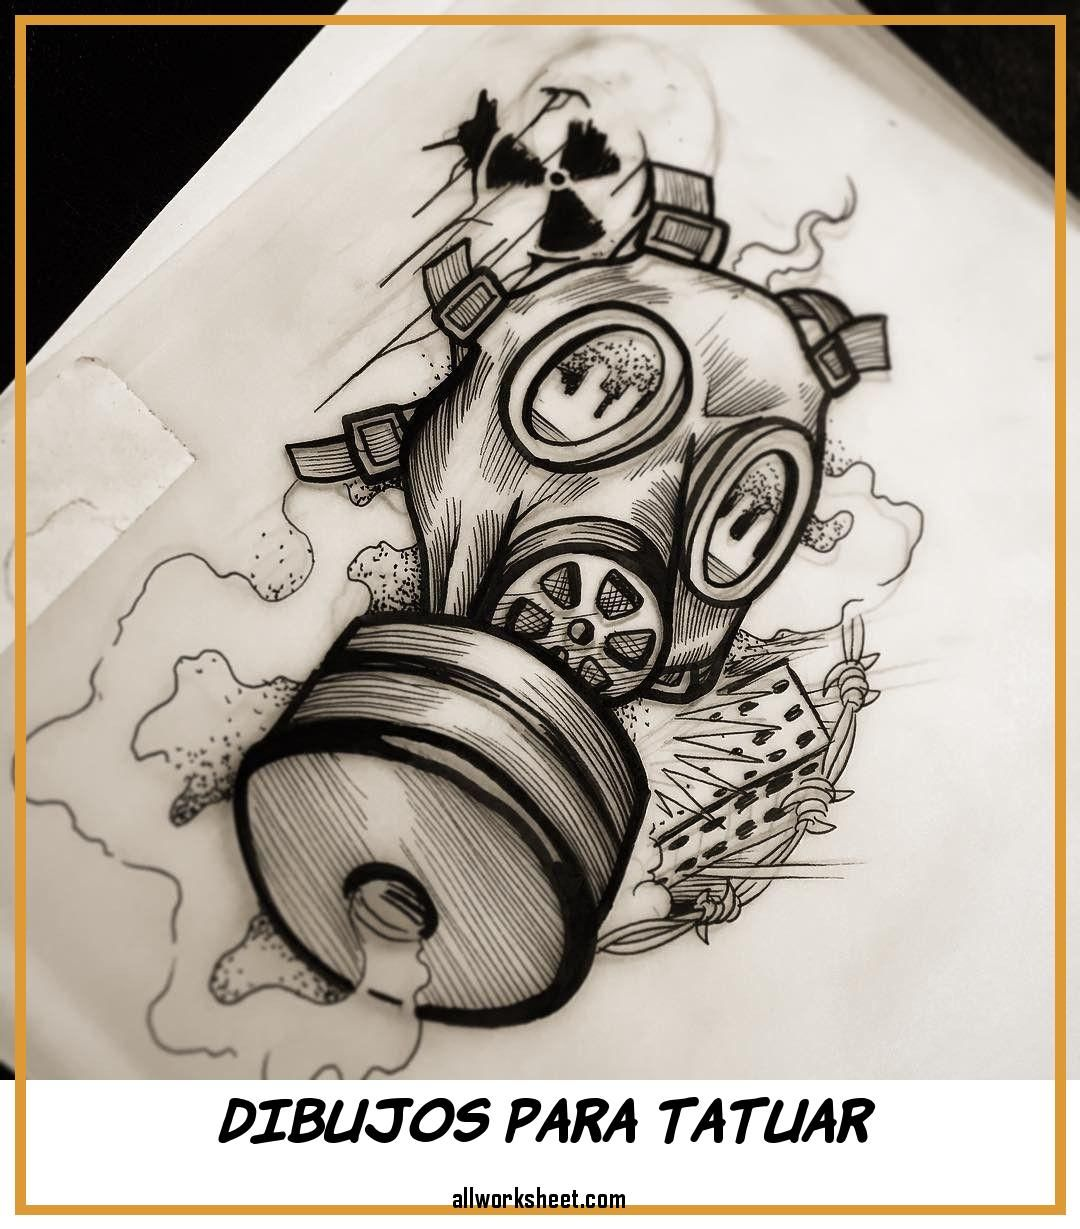 Dibujos Para Tatuar My New Insignia Chernobyl My New